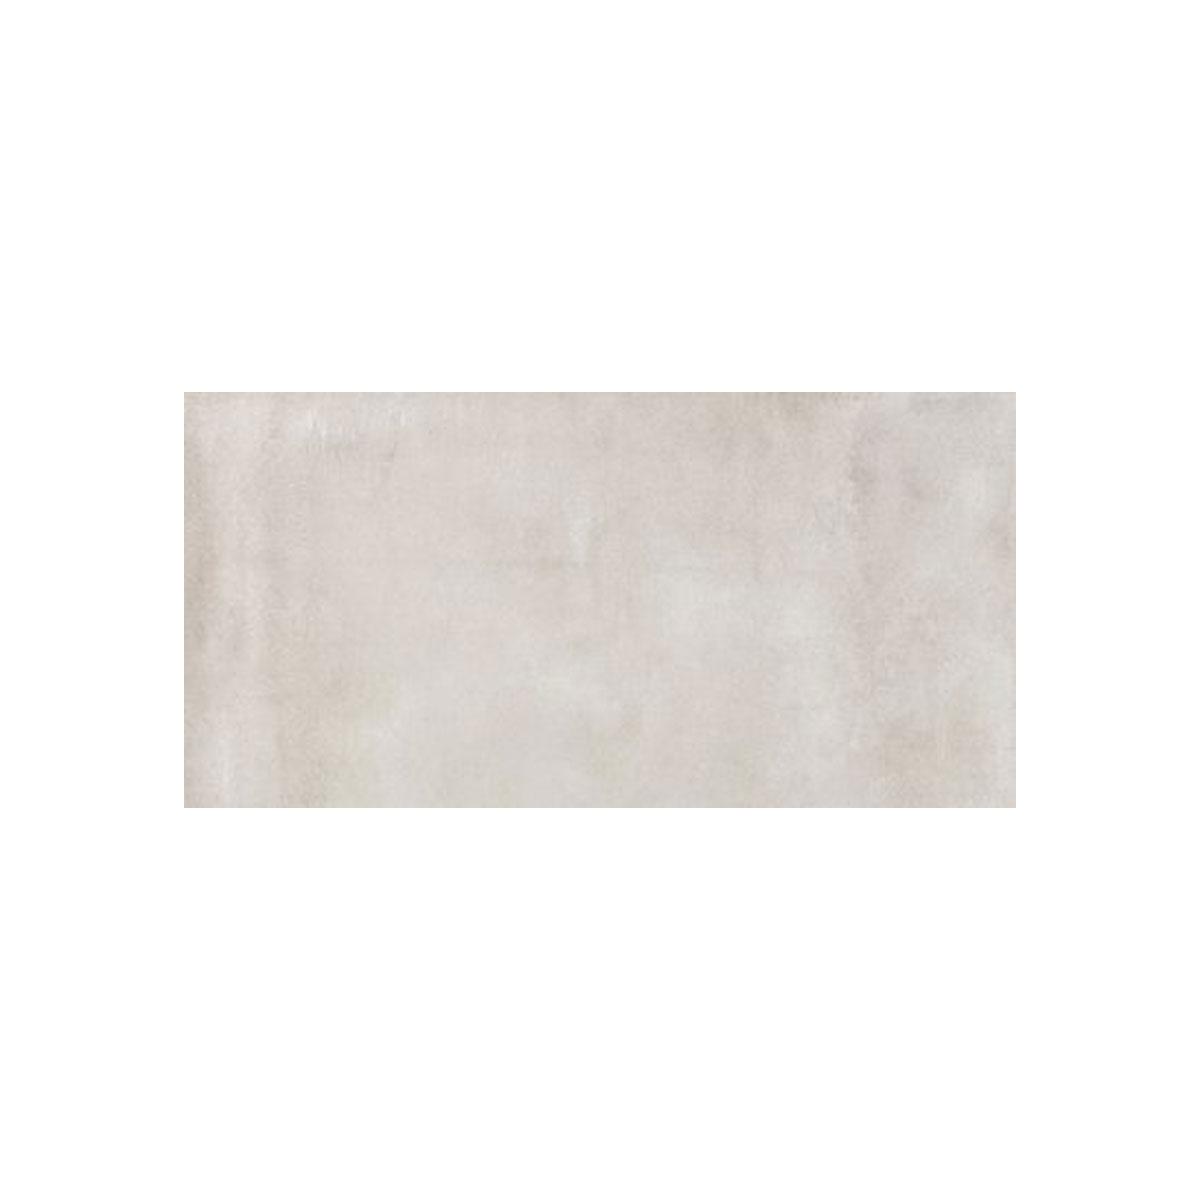 Basic Concrete - Grey - 300x600mm - Concrete Look Tiles - Stone3 Brisbane